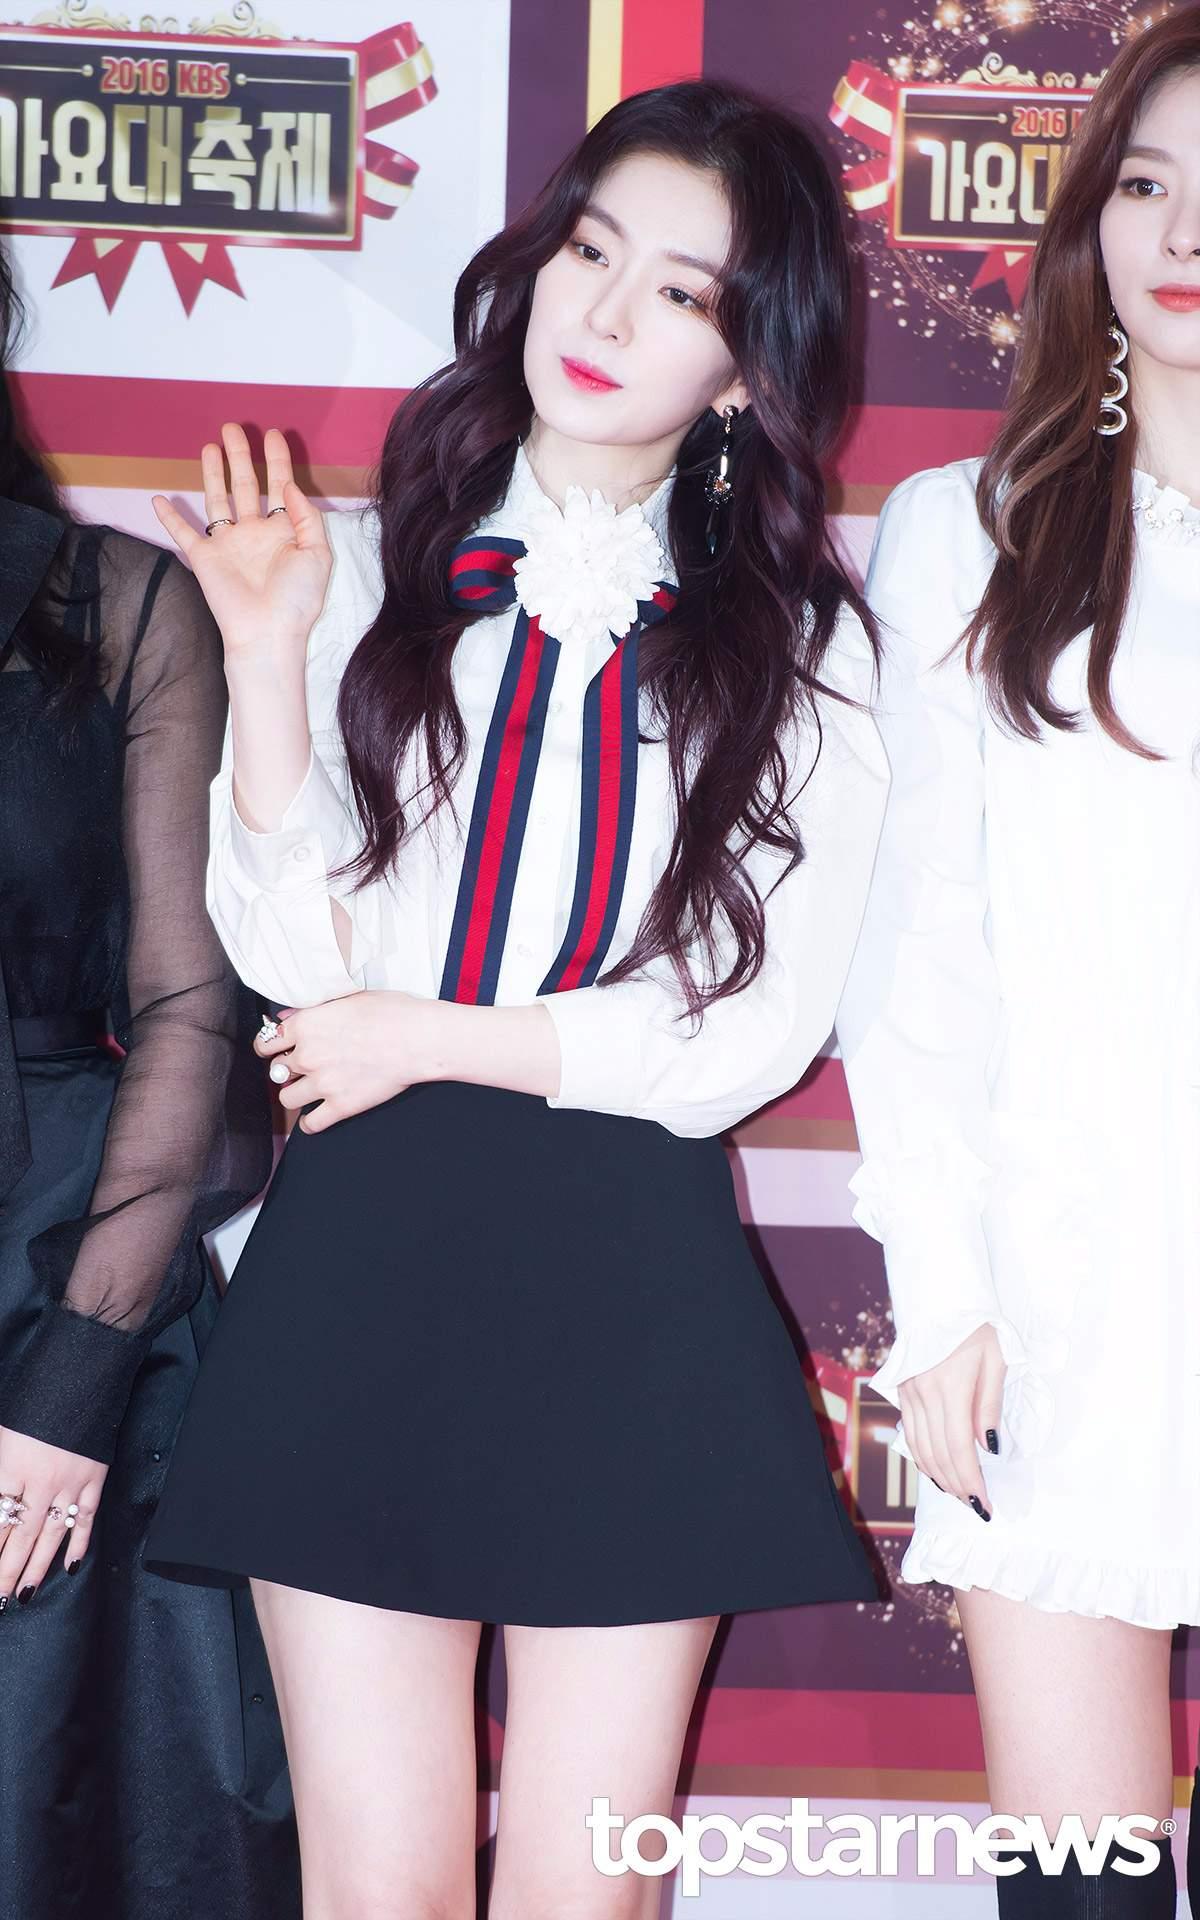 Red Velvet Irene Irene的魅力無窮~ 她肩負起照顧成員的責任,像是在家裡燙衣服XD 時而可愛、甜美、清純~不管男生還是女生都會深陷IRENE的魅力啊!